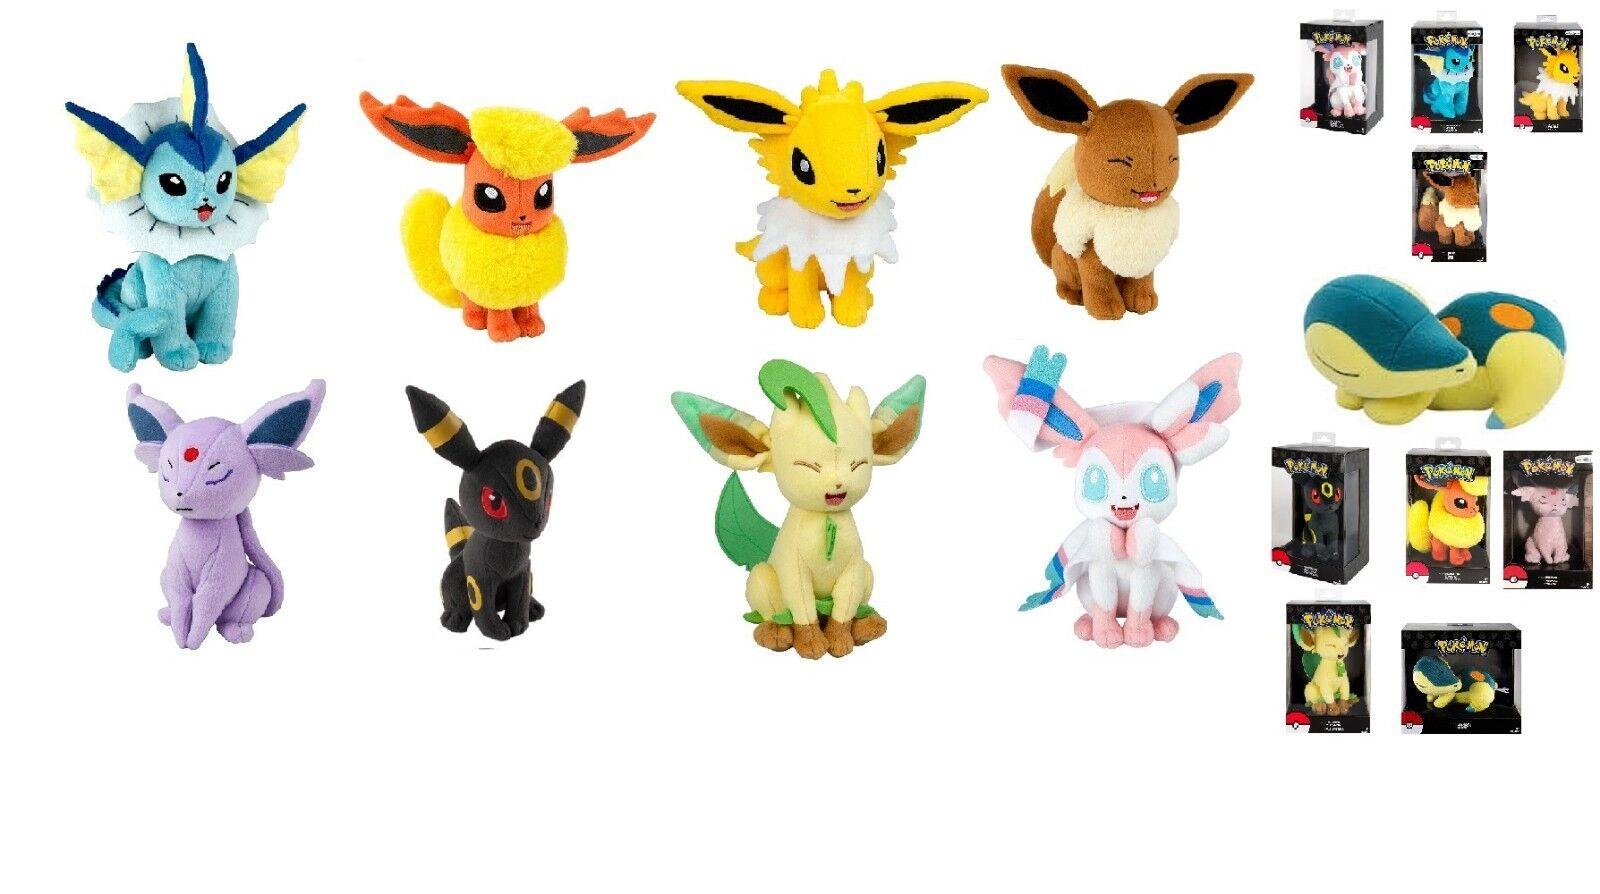 9-Raro Pokémon Plush Juguetes R Us Exclusive.